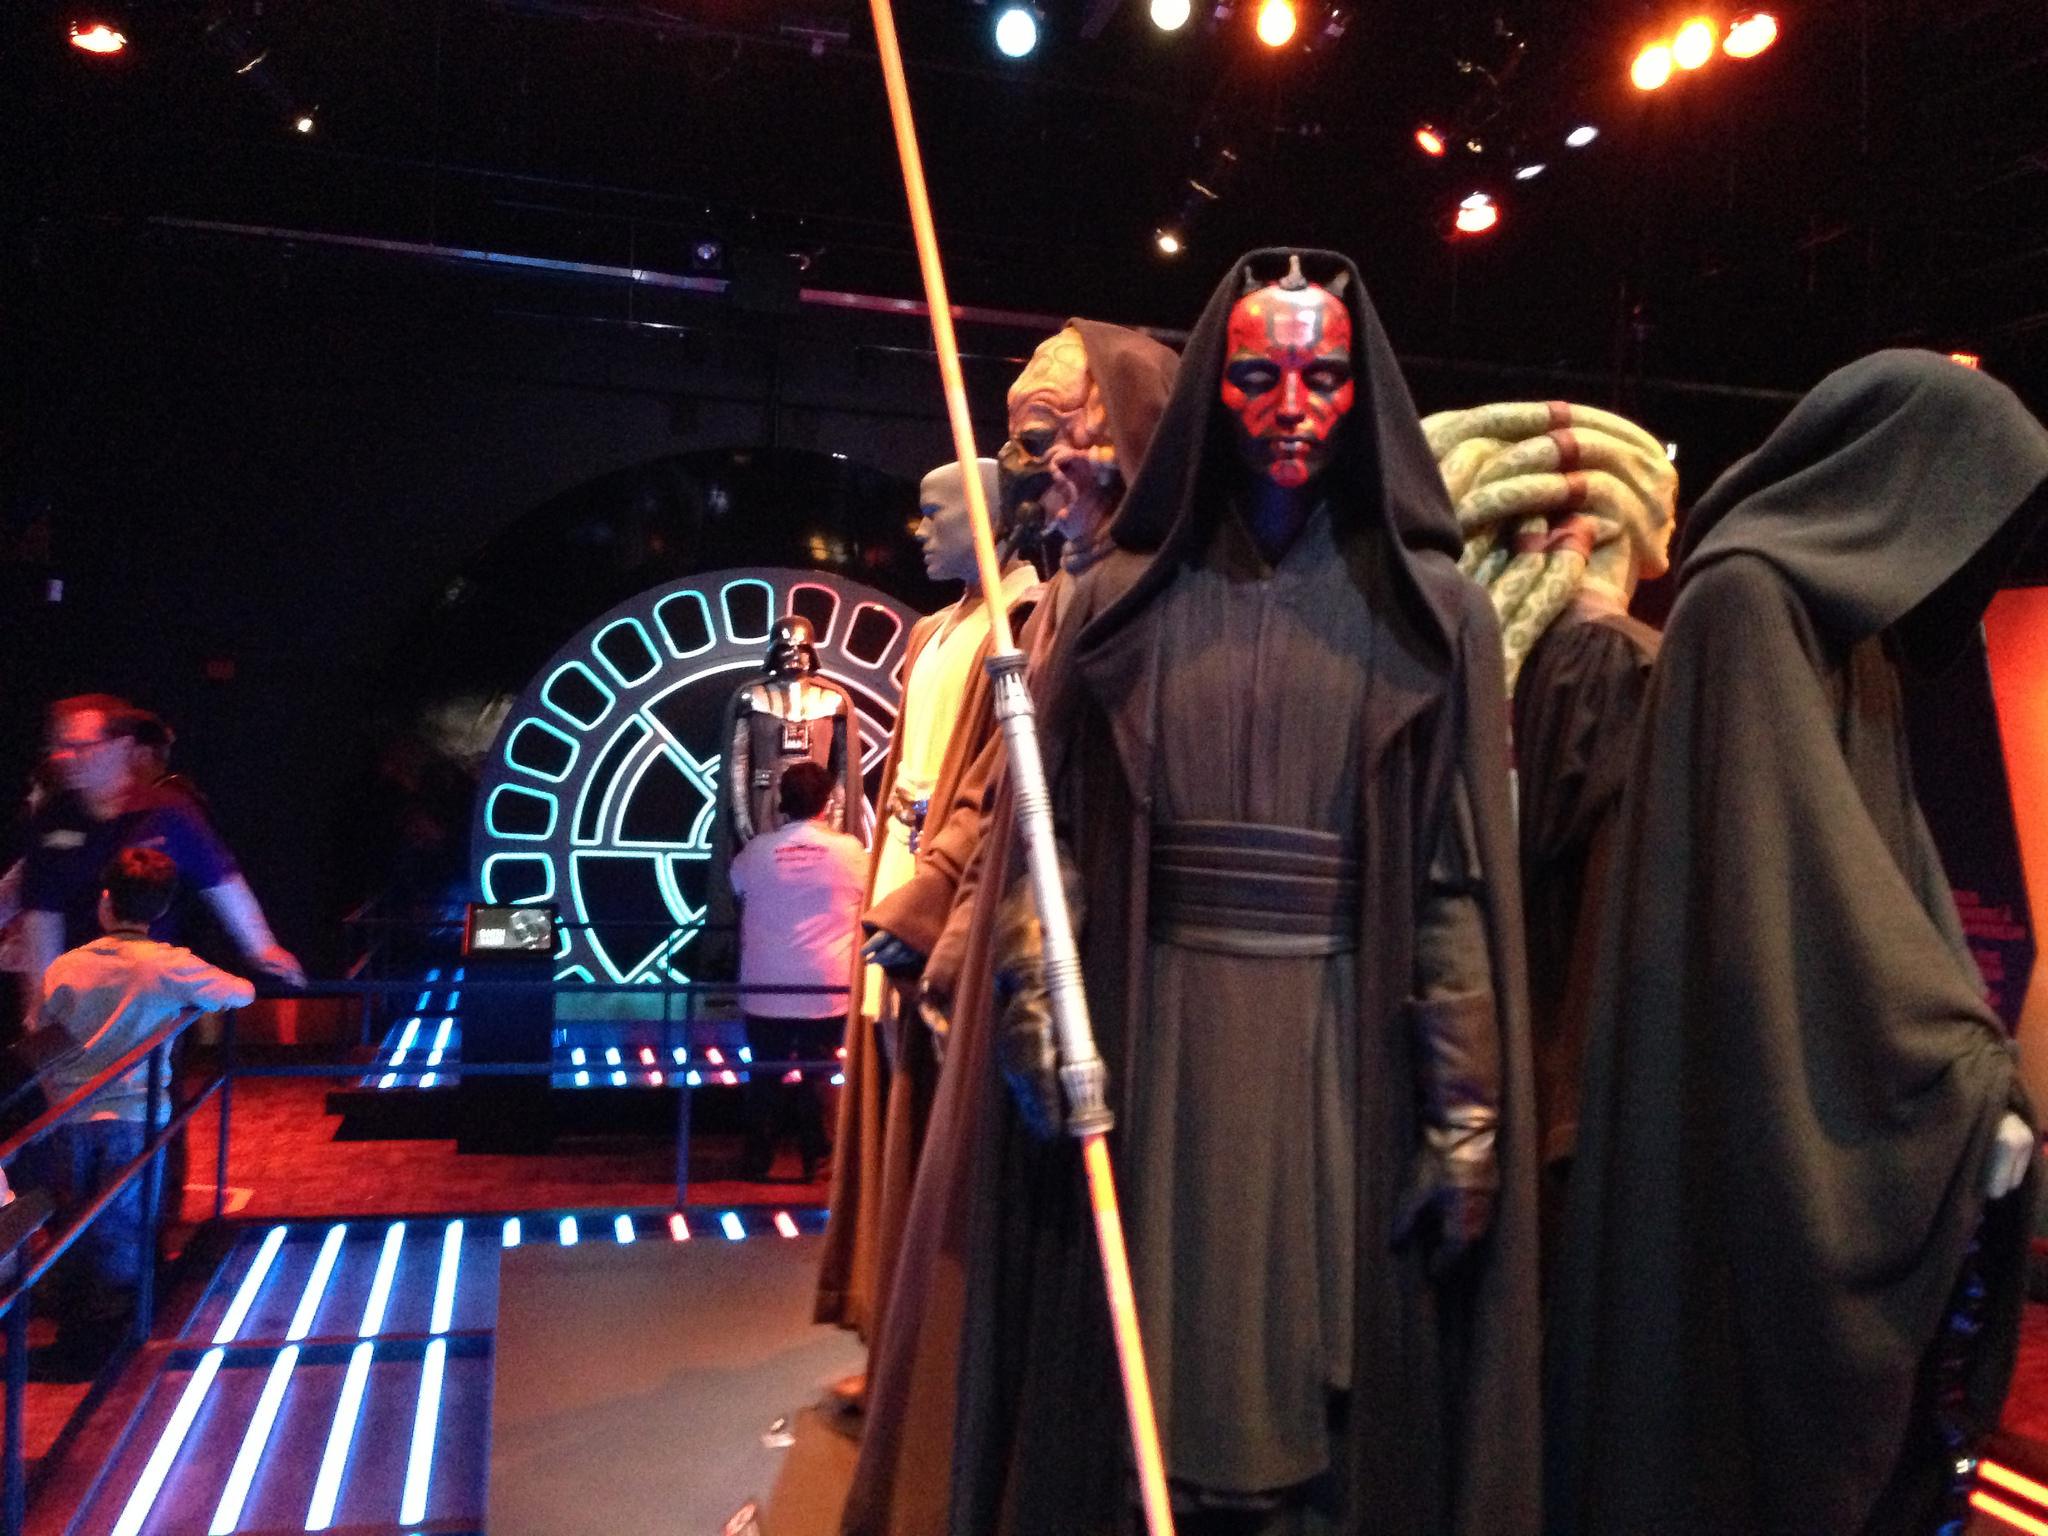 Dark Side at Star Wars Identities